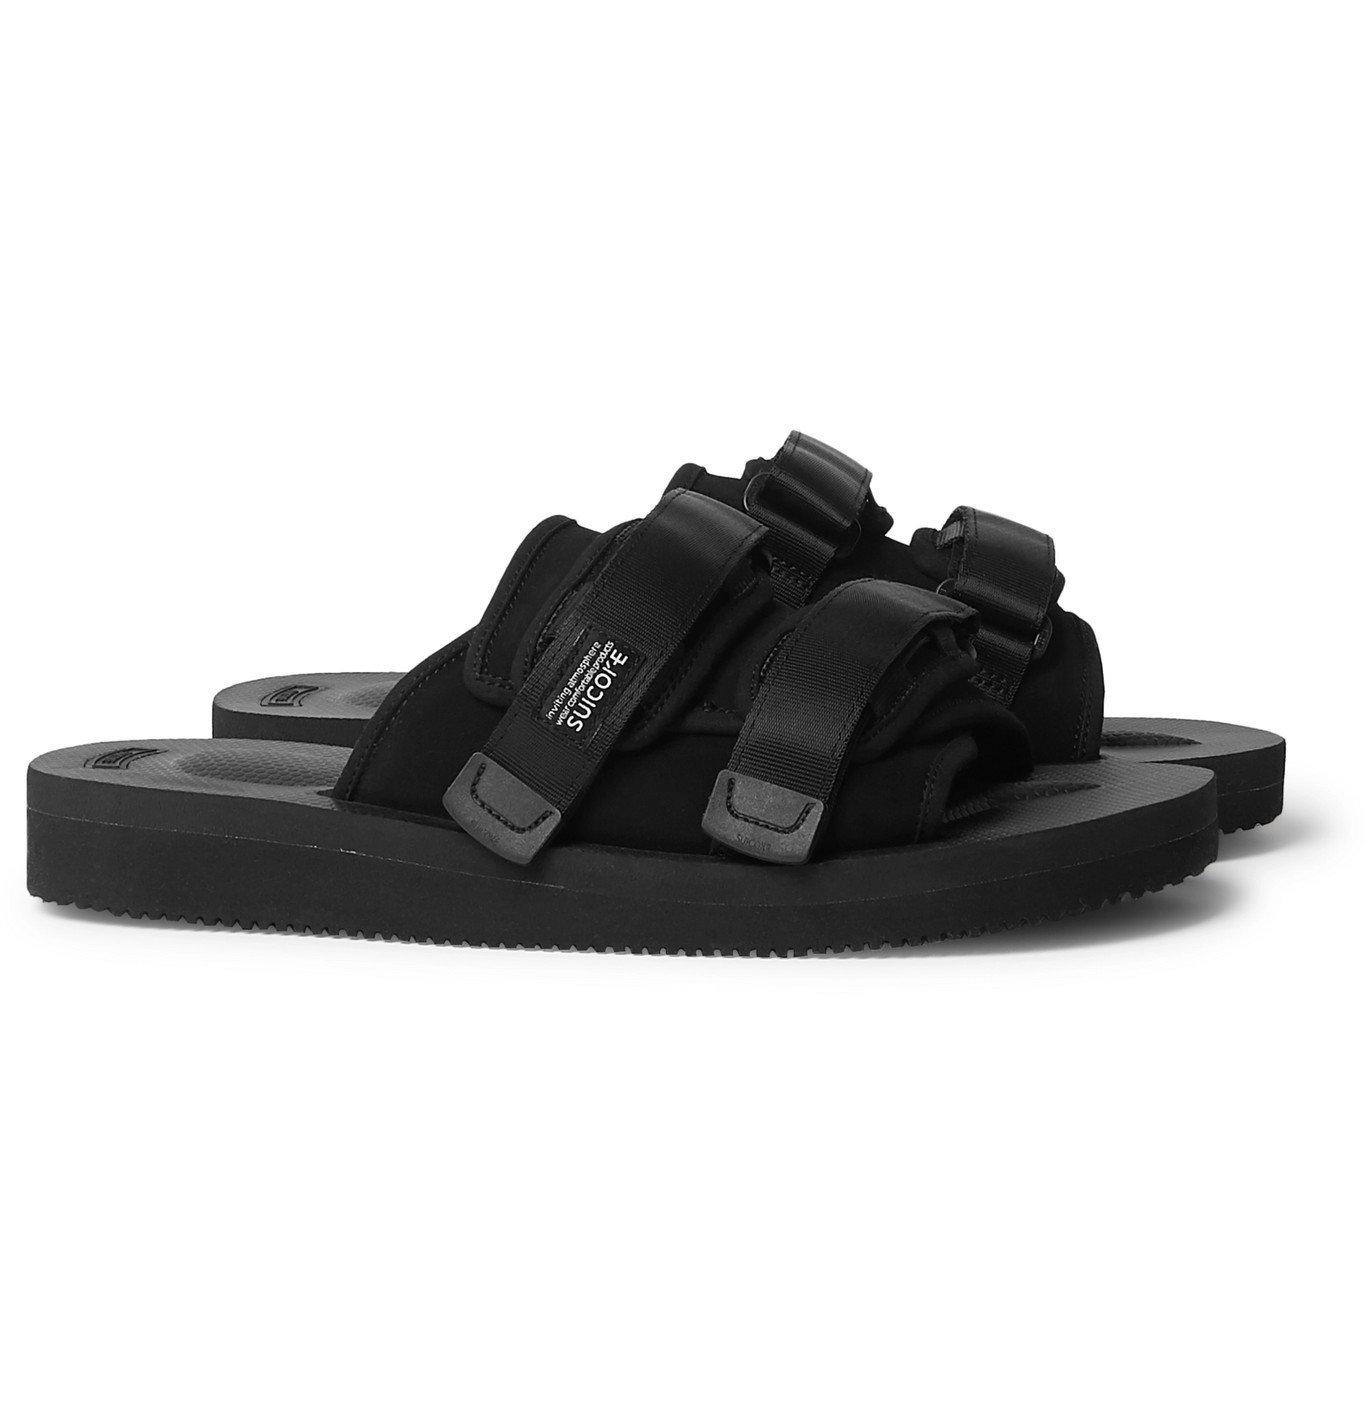 Photo: Suicoke - Moto-VS Webbing-Trimmed Suede Sandals - Black